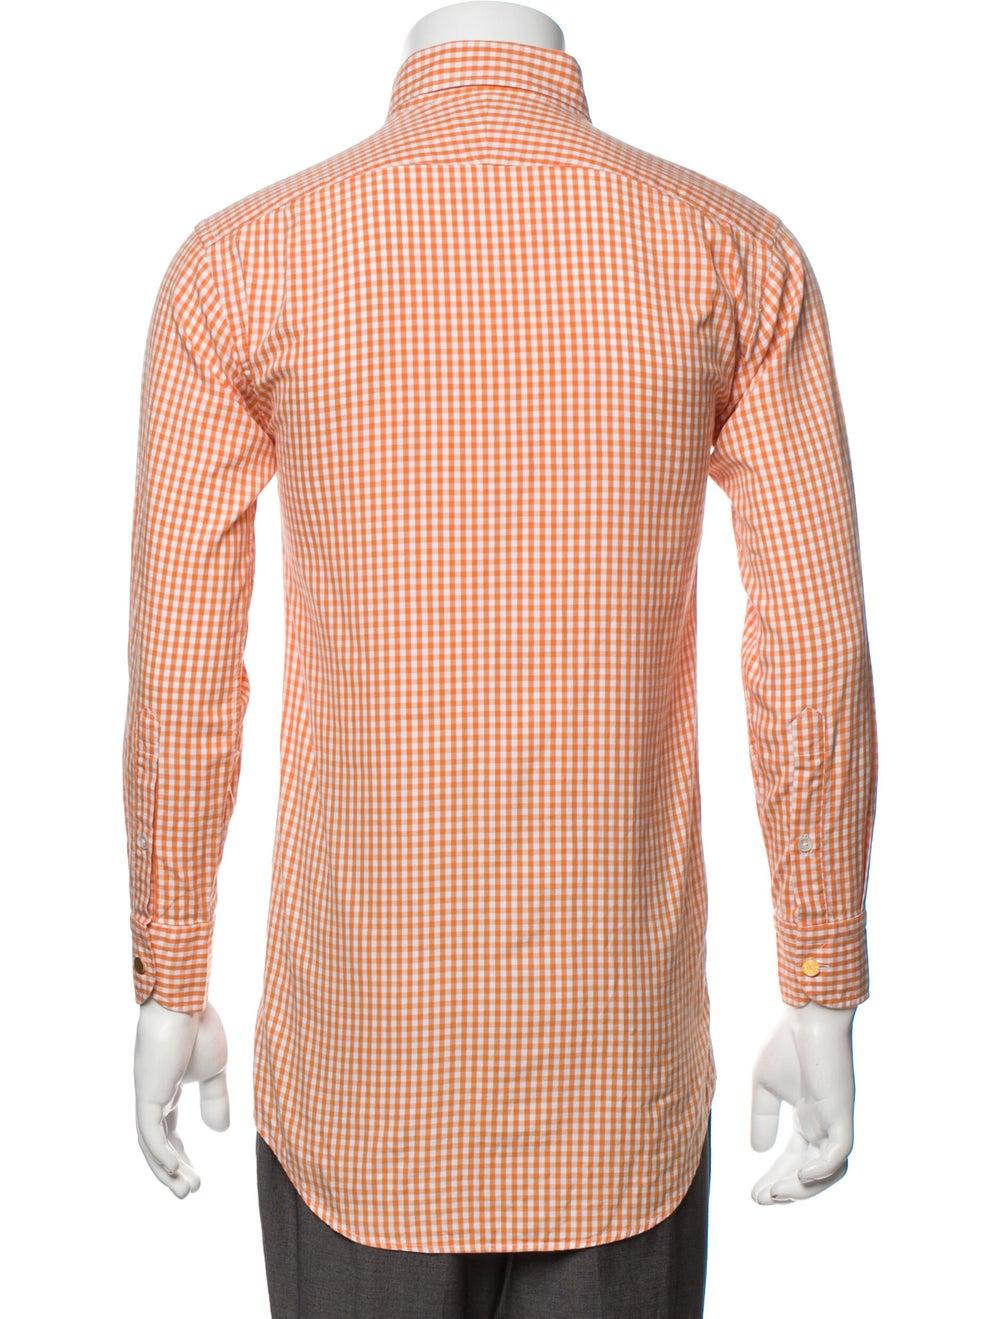 Hermès Vintage Plaid Print Shirt Orange - image 3